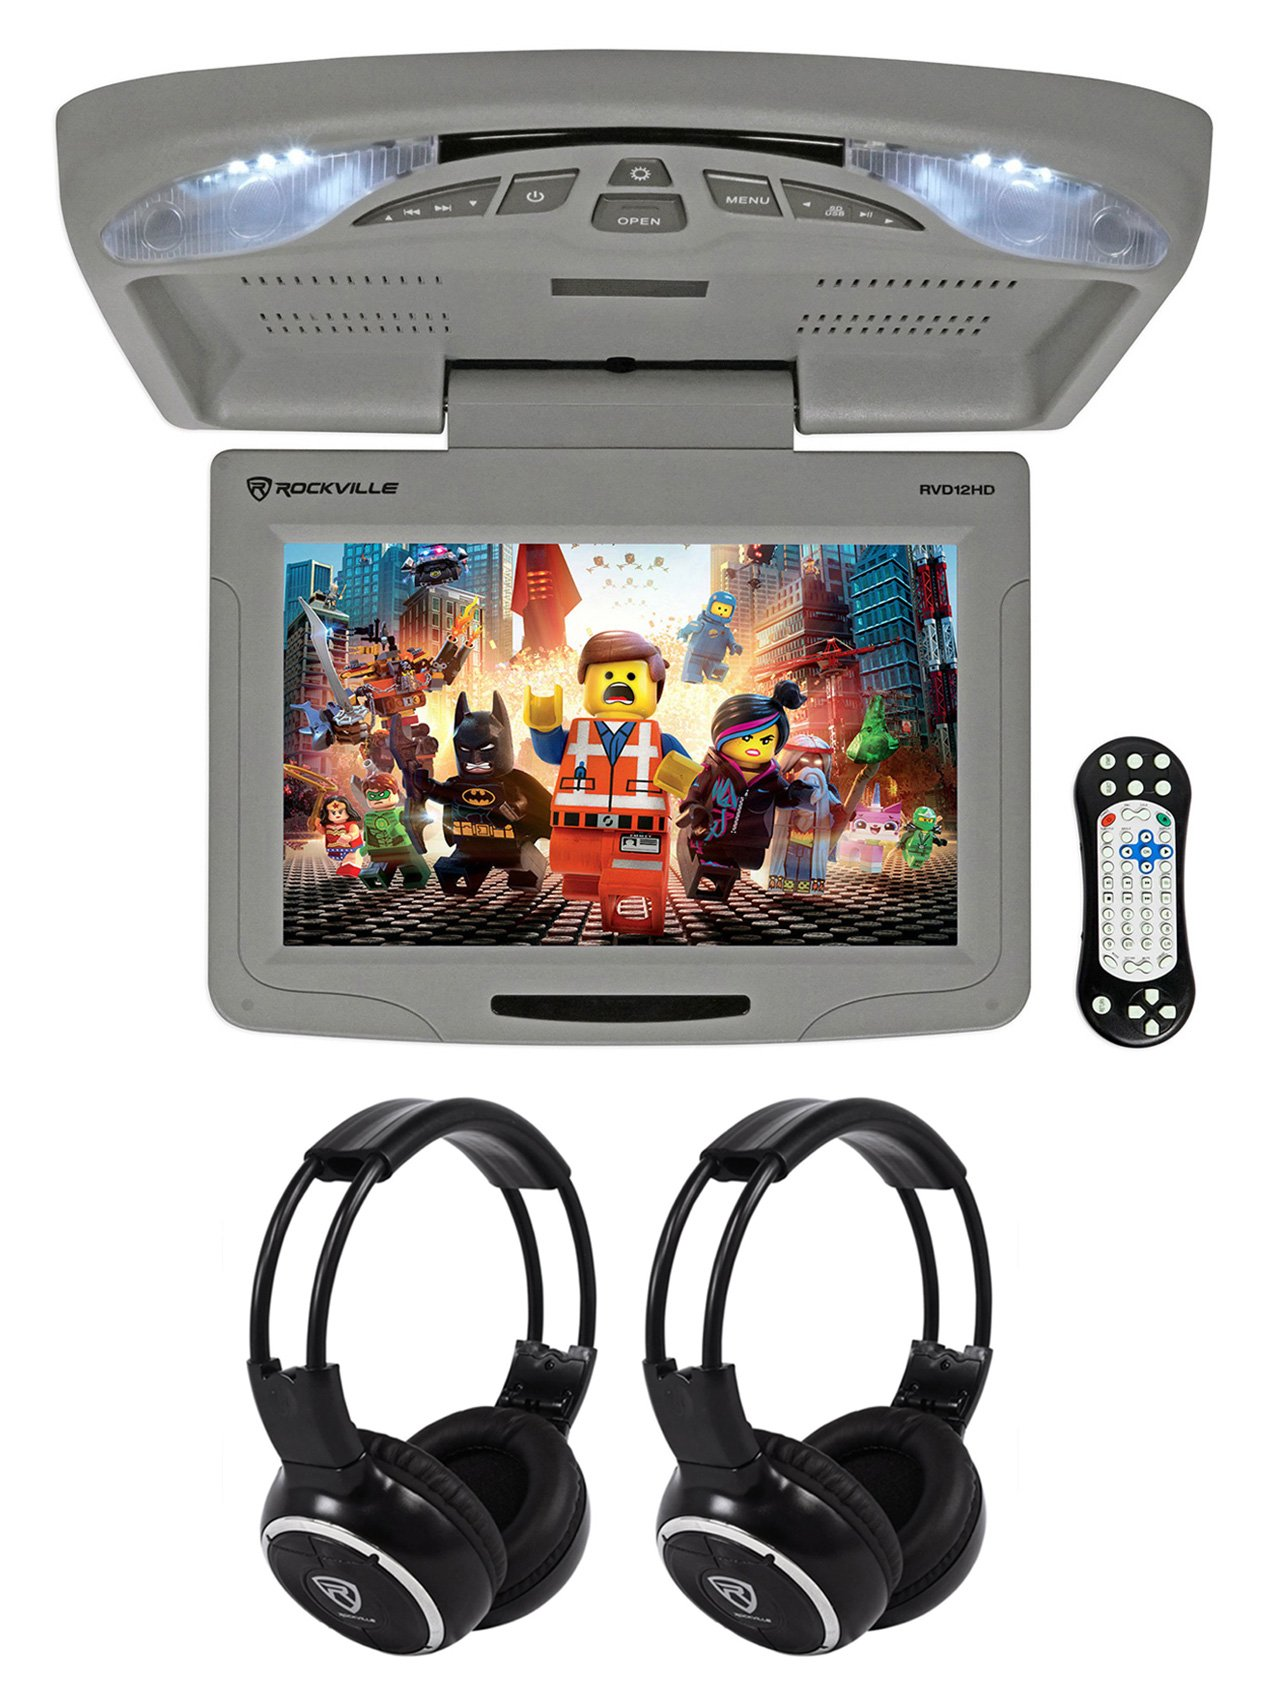 Rockville RVD12HD-GR 12'' Grey Flip Down Car Monitor DVD/USB/SD Player+Headphones